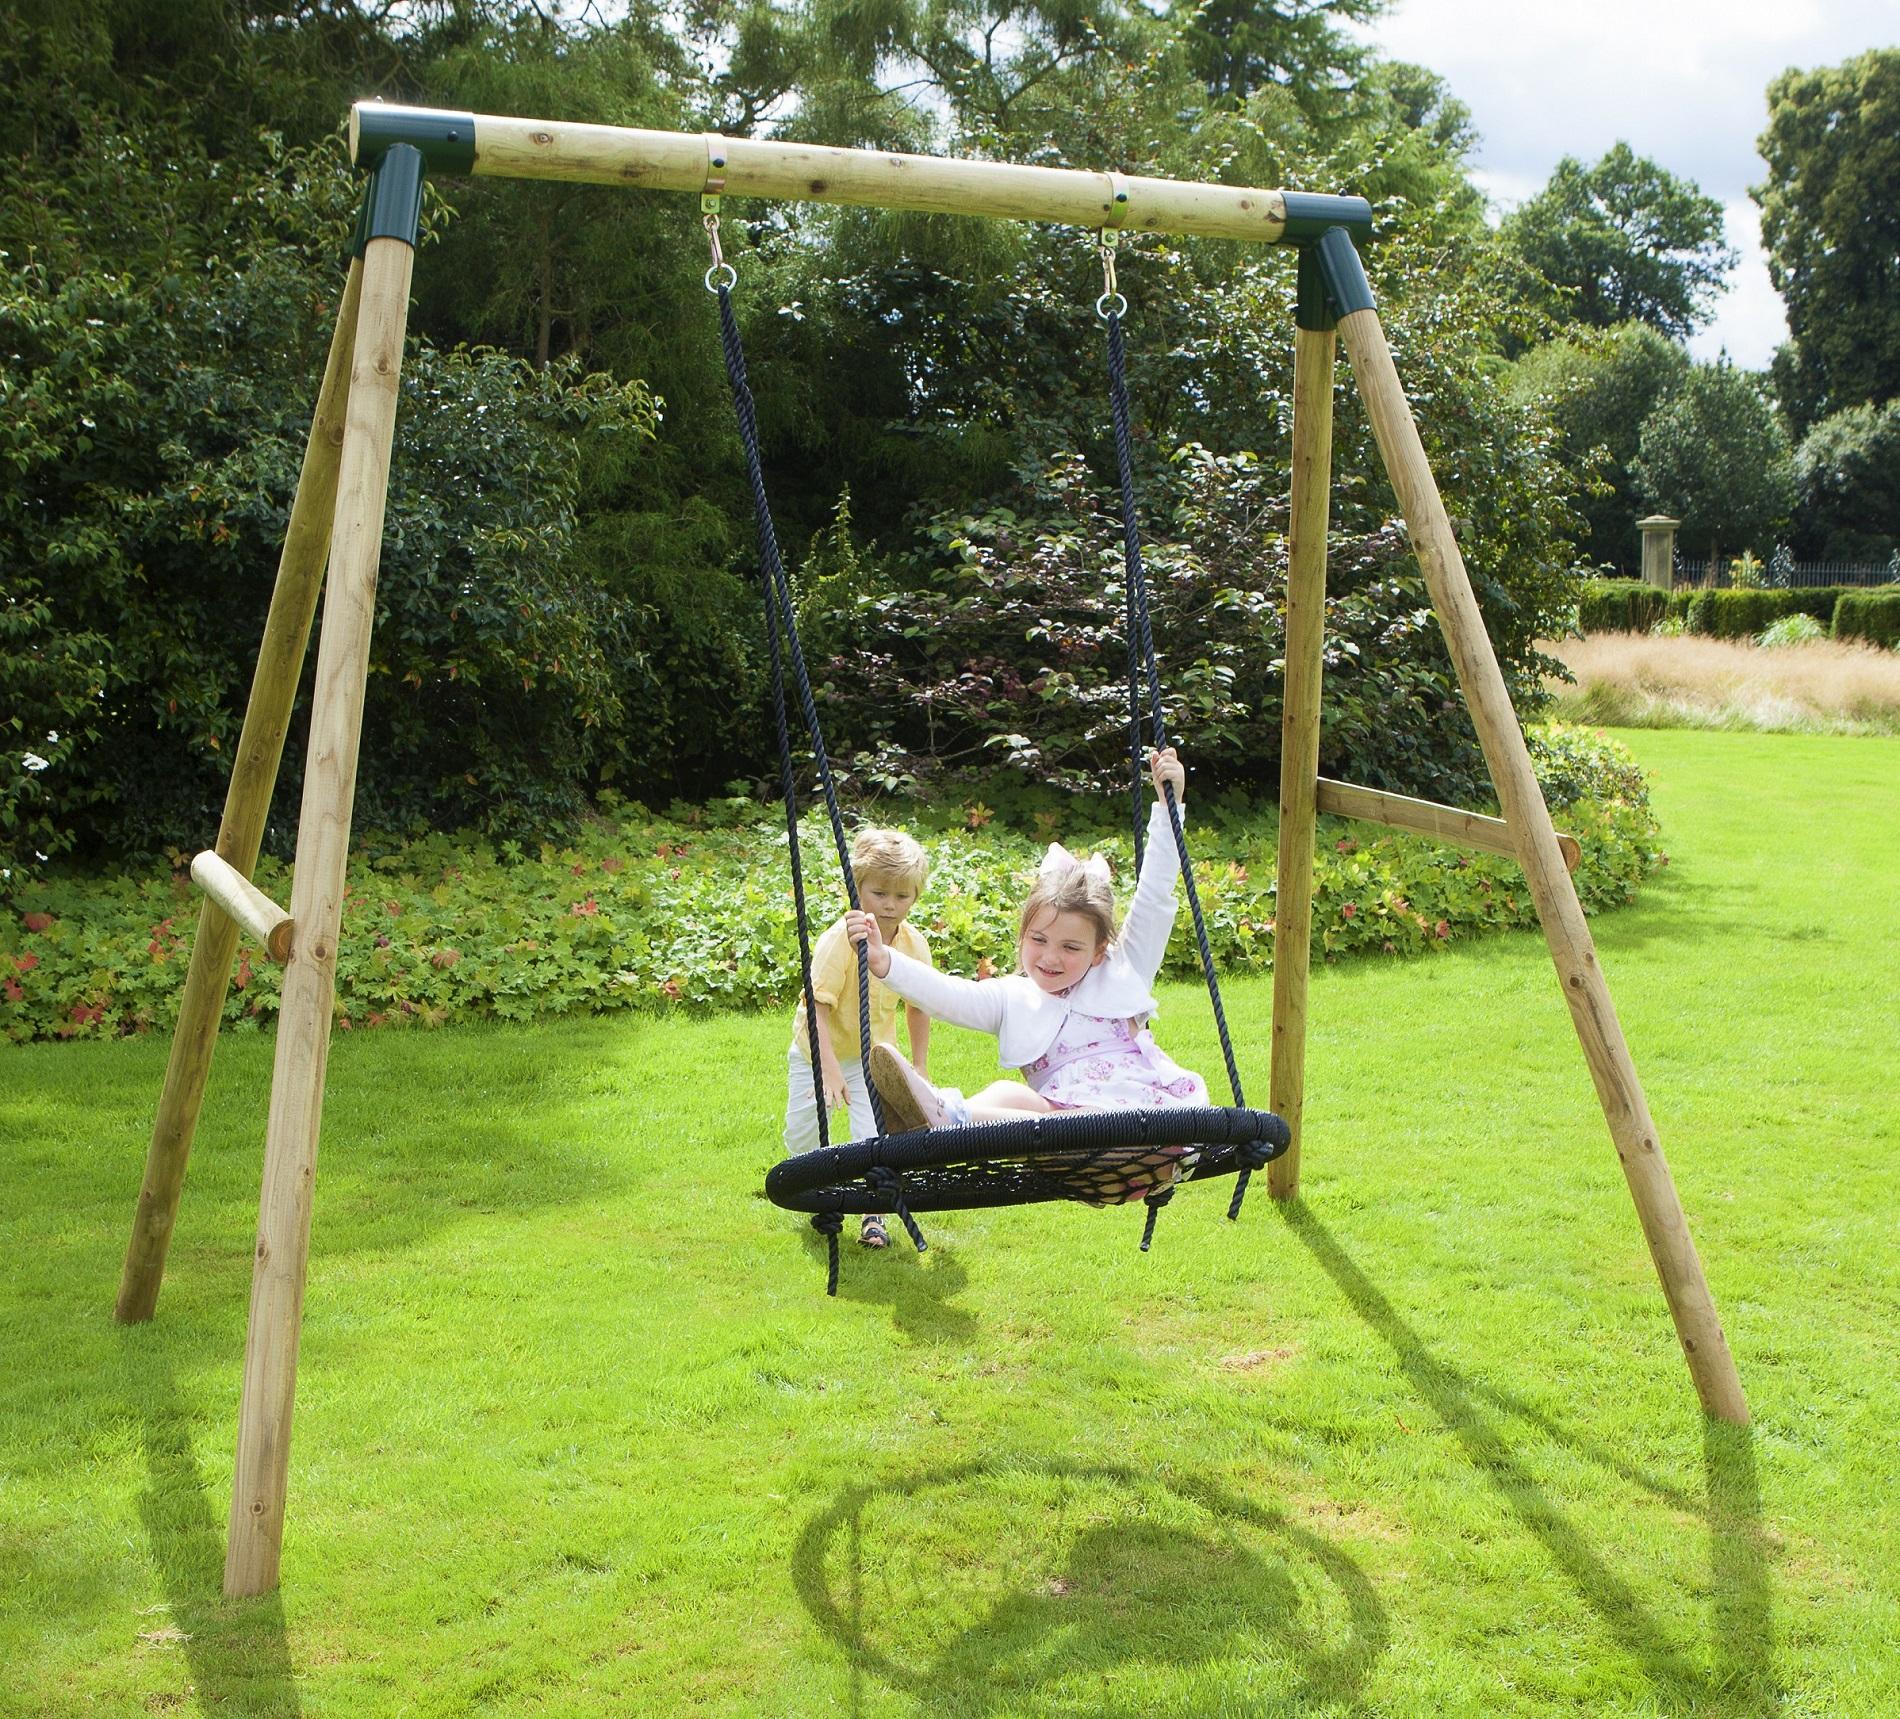 Rebo Mercury Wooden Garden Swing Set - Spider Net/Nest ...